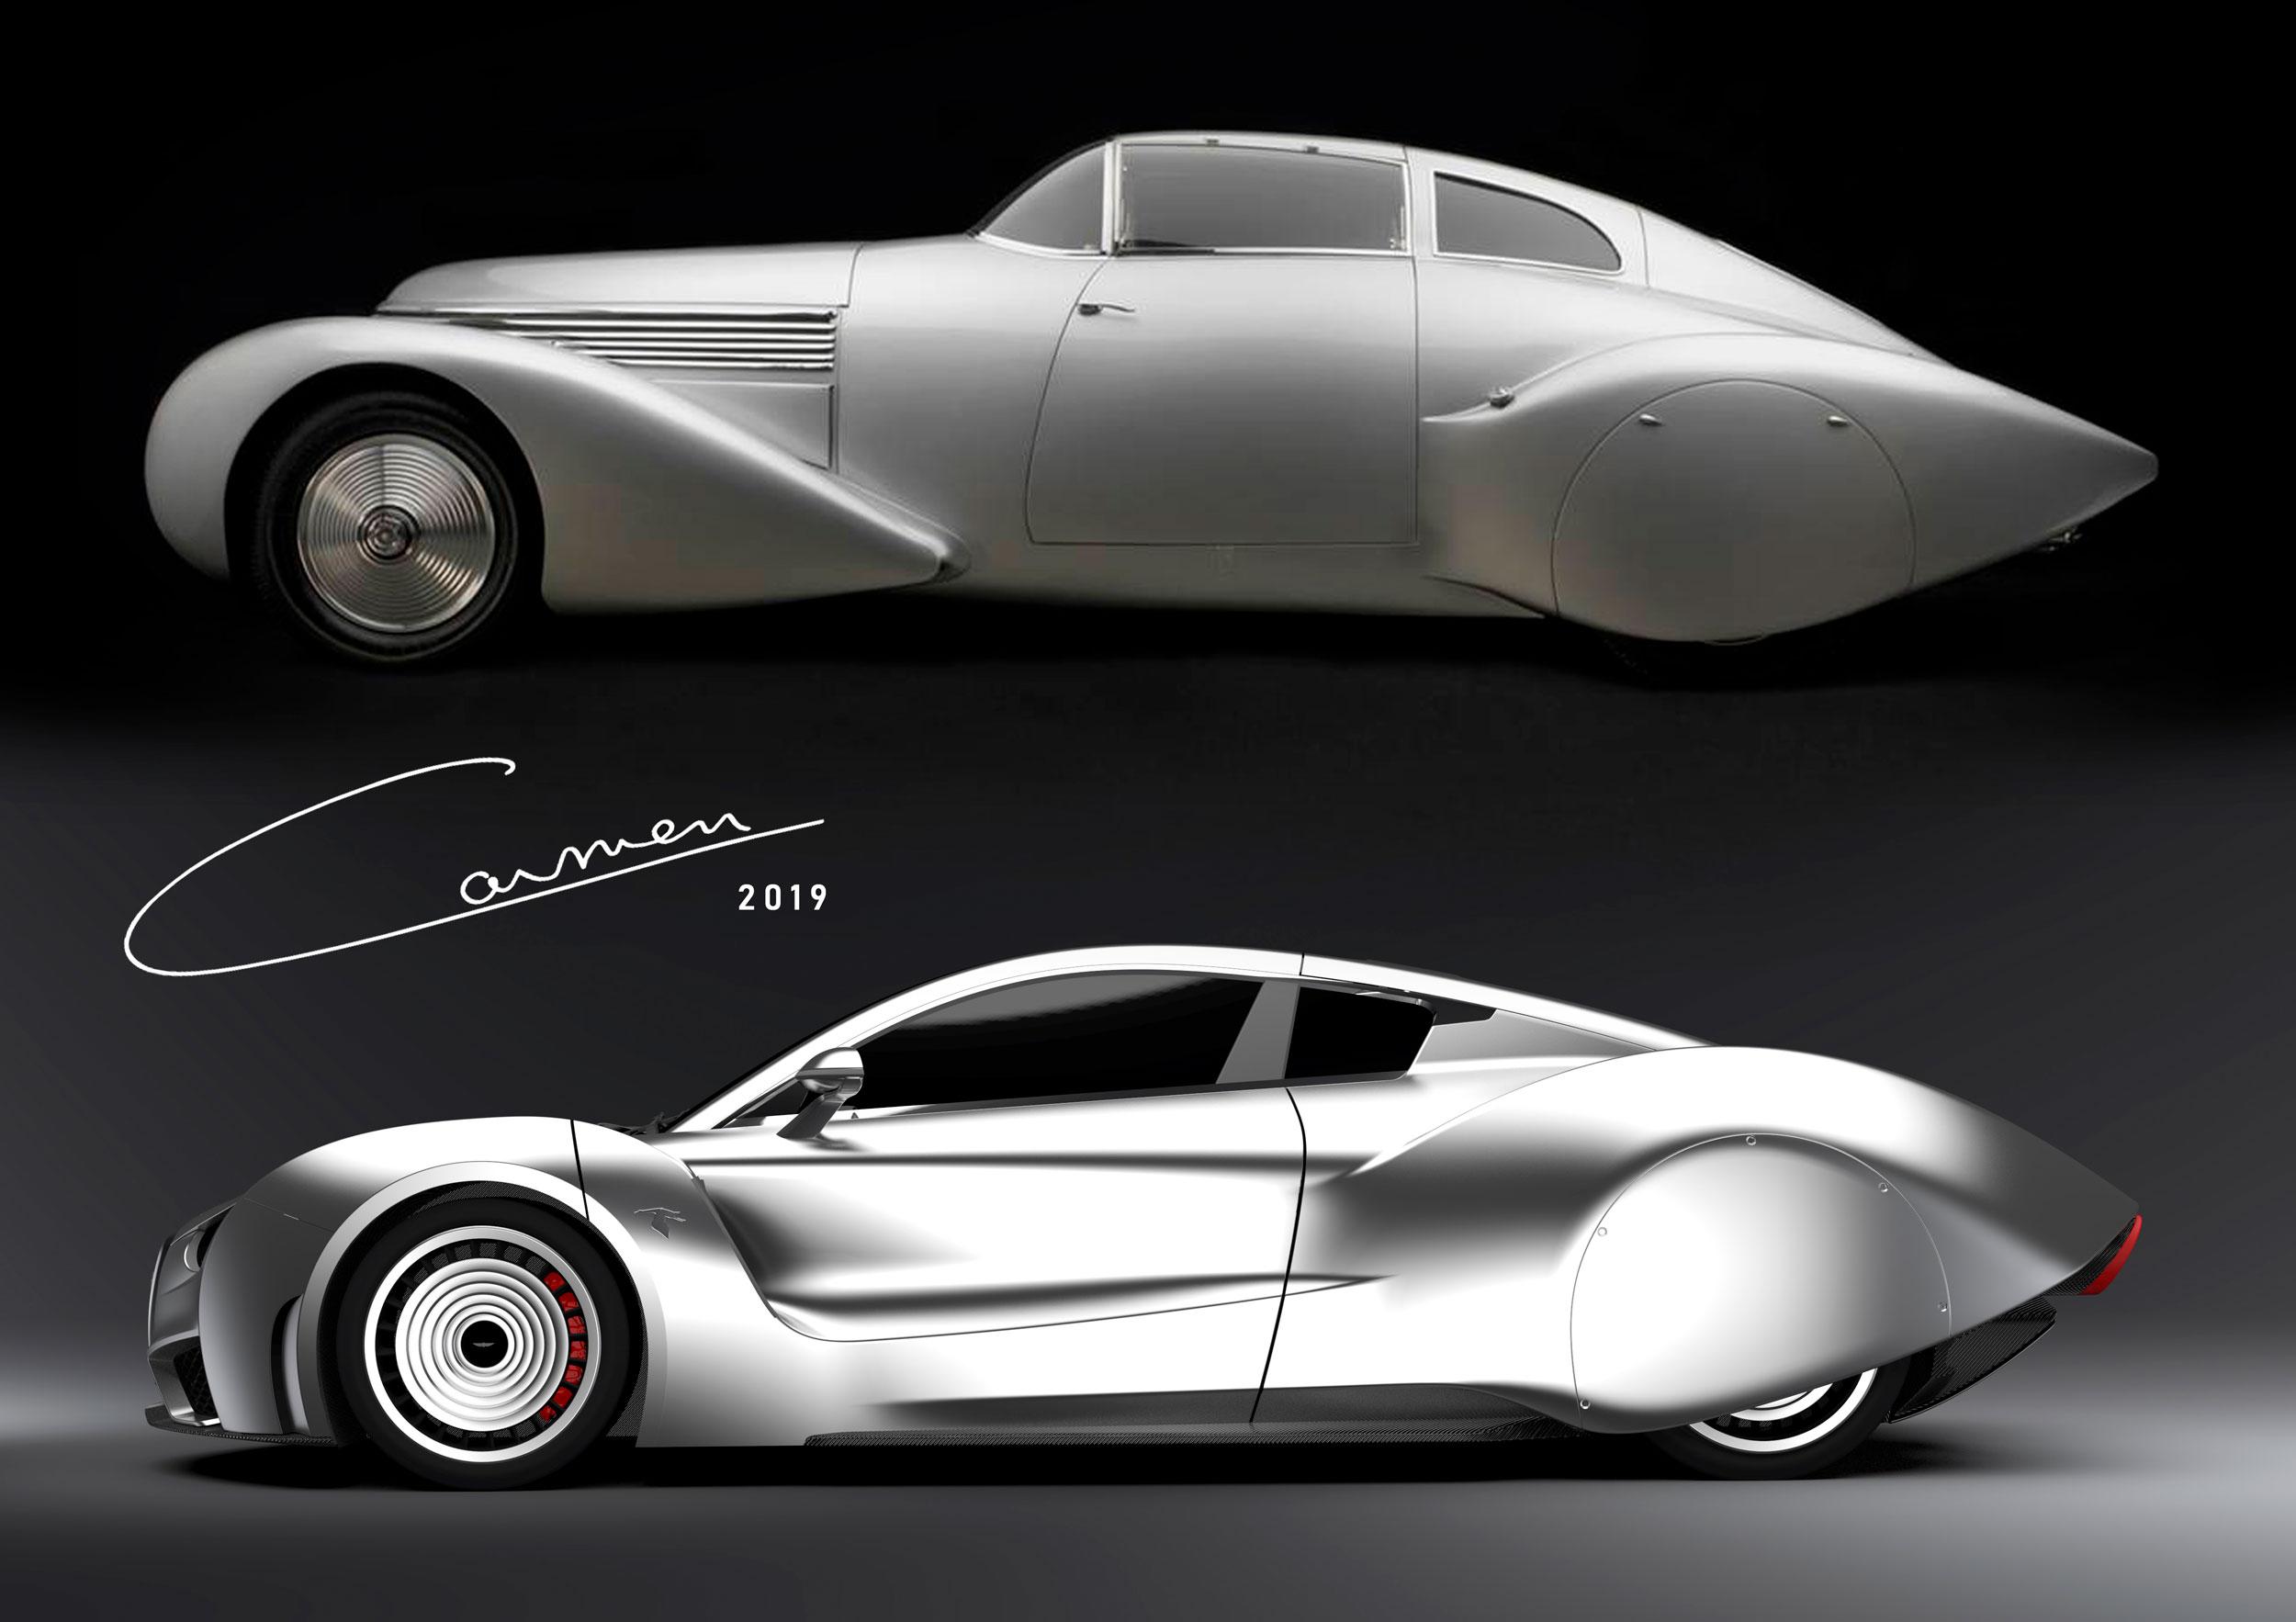 Hispano-Suiza Carmen classic and new